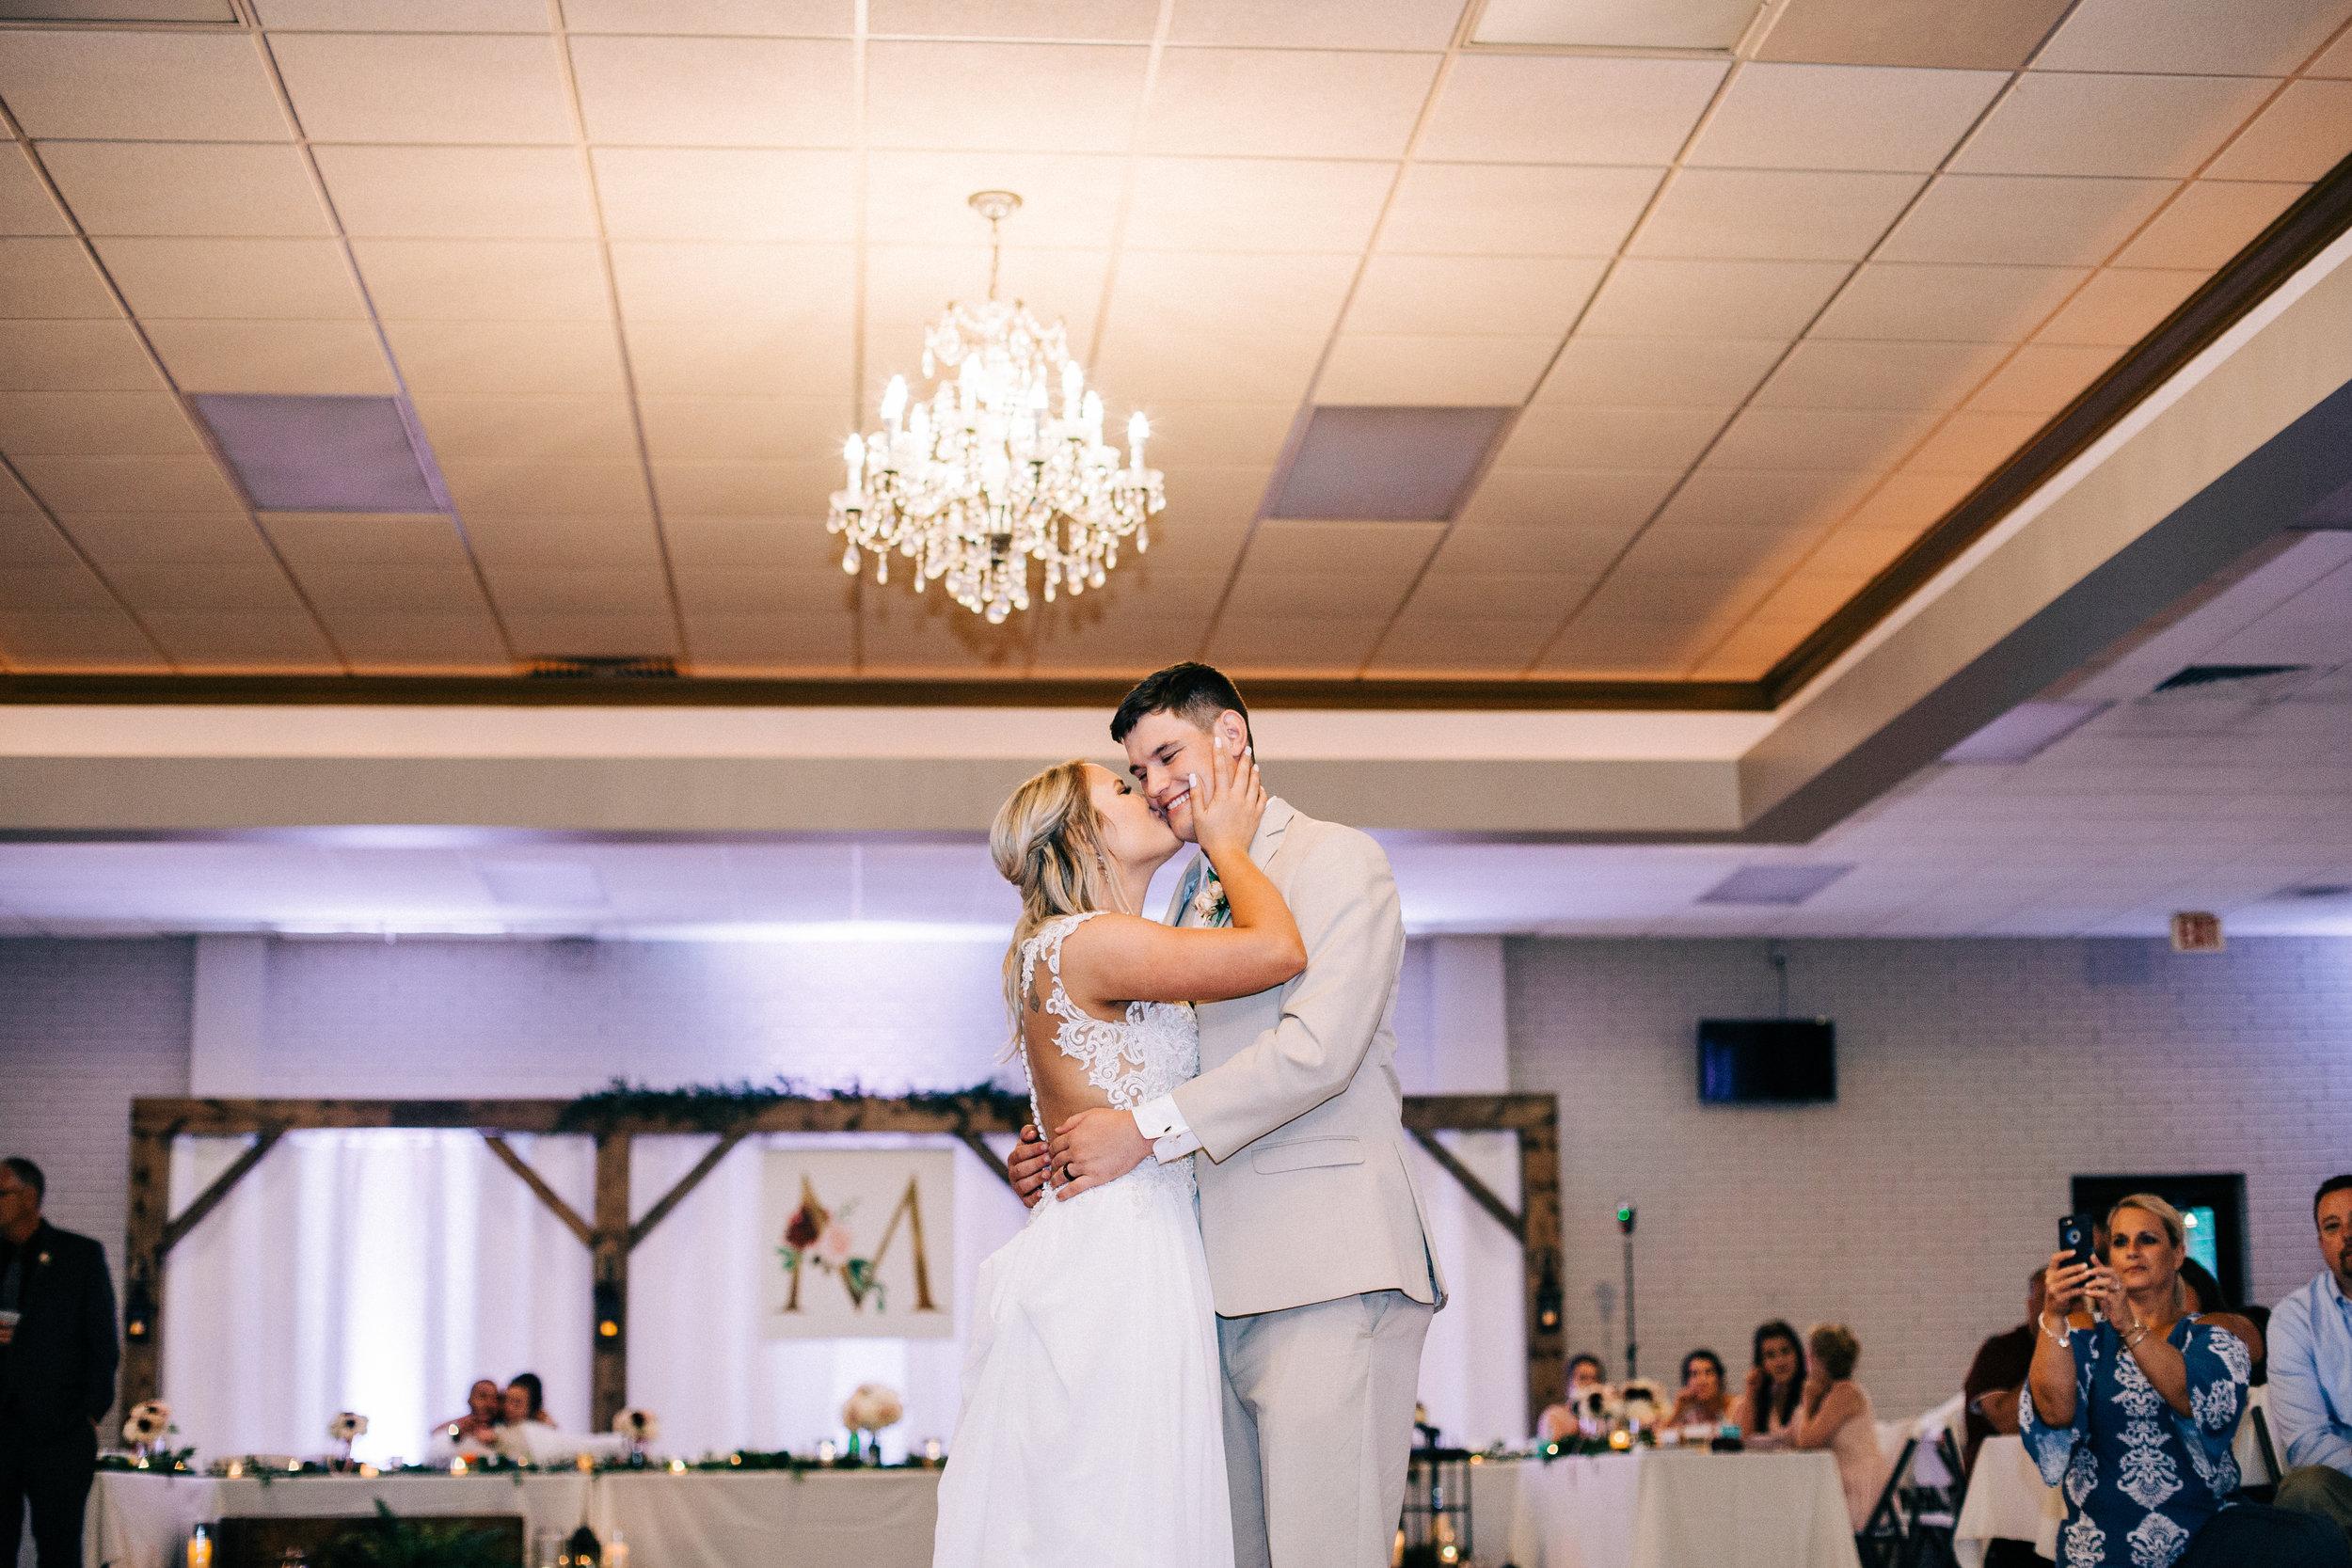 Dorothy_Louise_Photography_Marissa_Jake_Wentzville_MO_Wedding-178.jpg